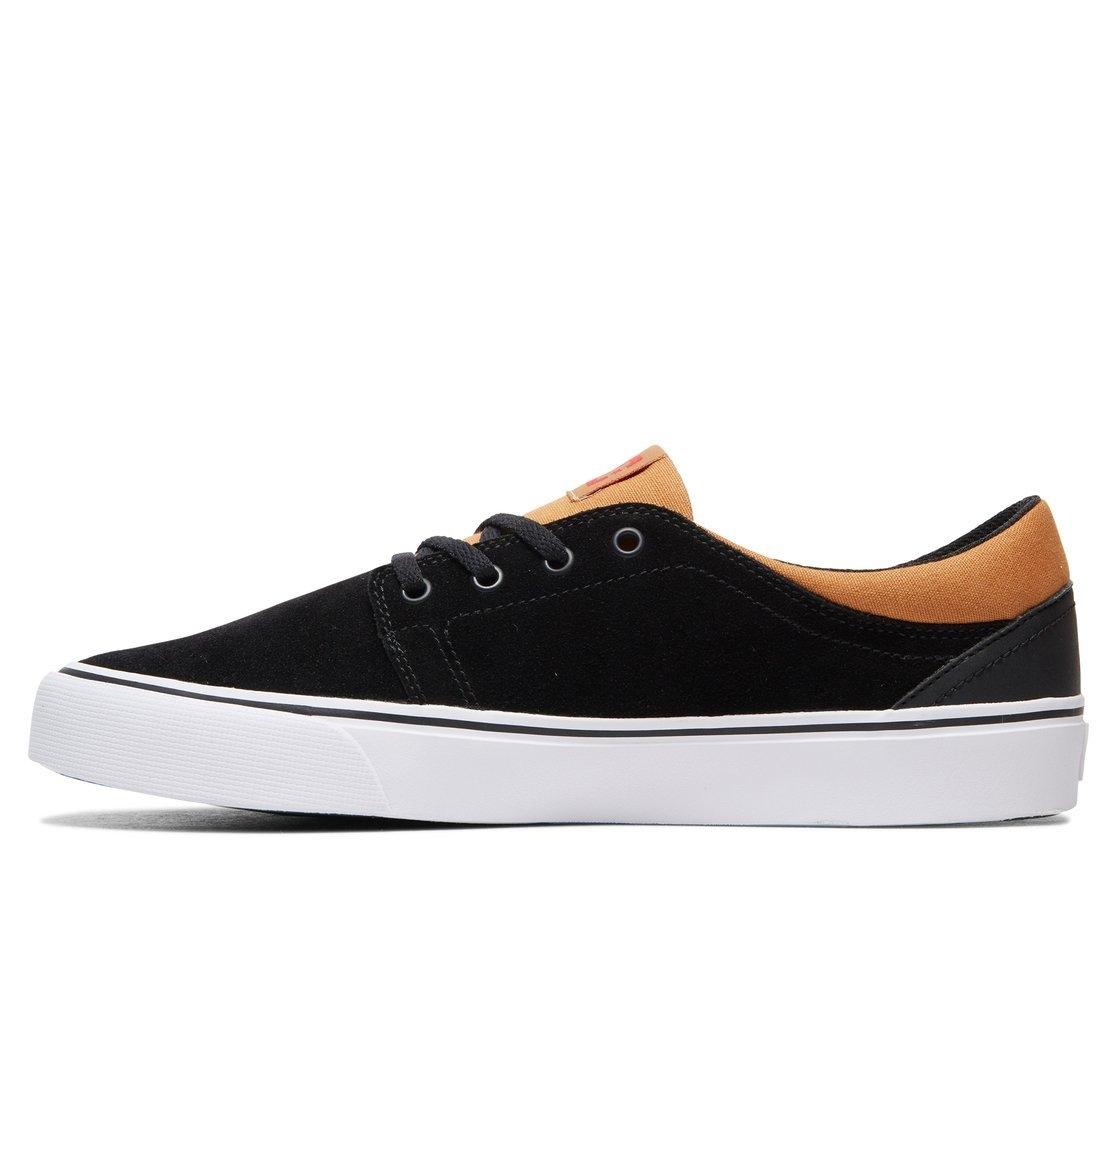 Sd Besteld Makkelijk Shoes Dc Schoenentrase WbE92eDHIY